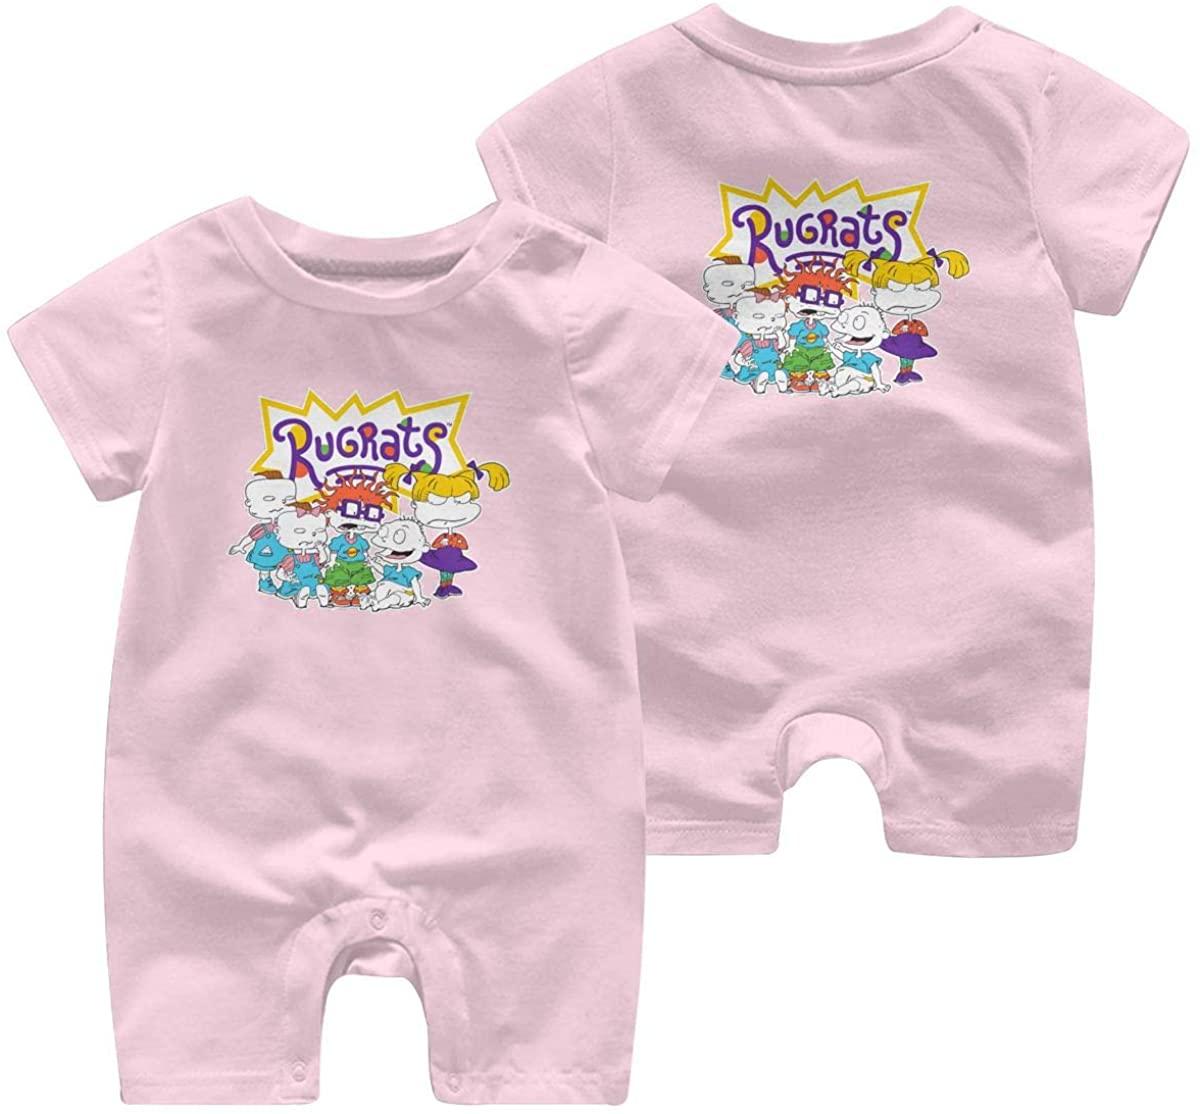 Qwertyi Baby Rugrats Swirl Splatter Short Sleeve Jumpsuit